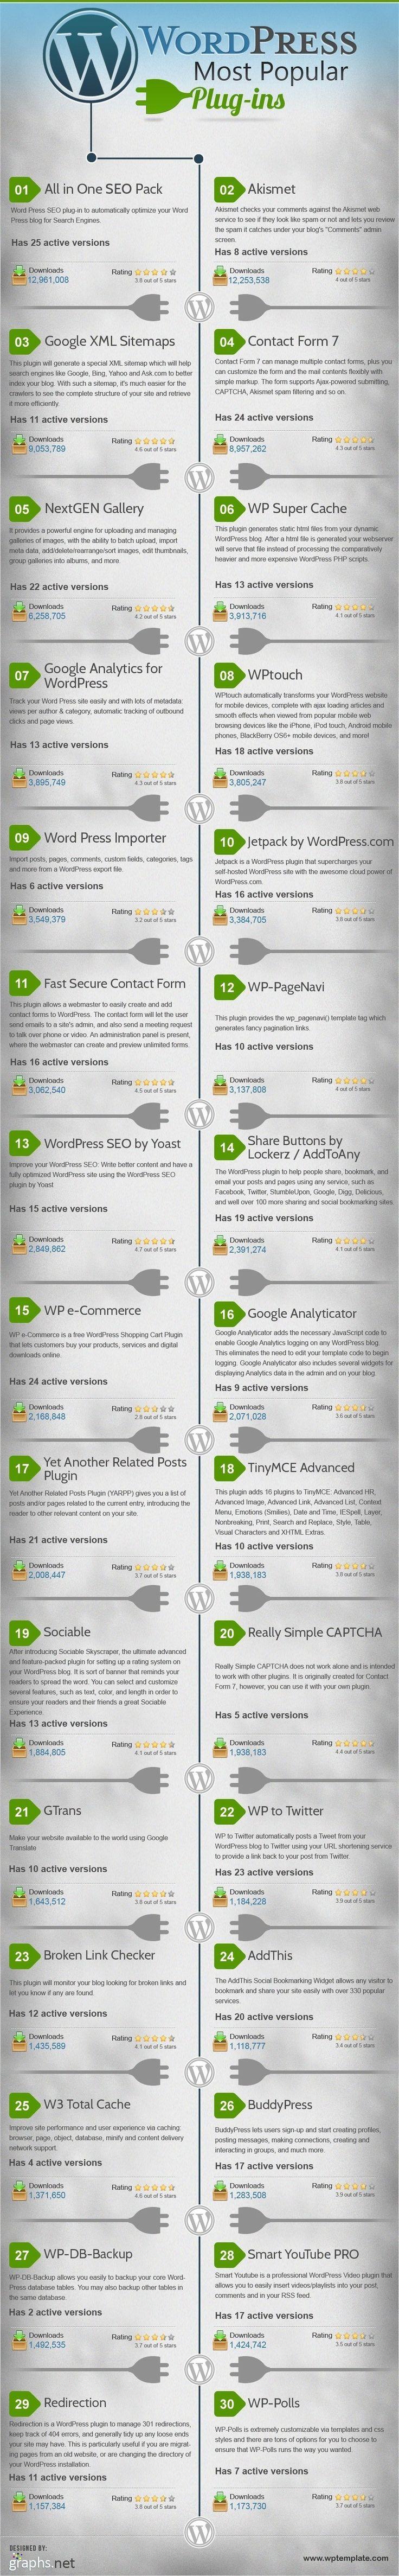 Top 30 Best & Most Popular WordPress Plugins http://sco.lt/7TUd3h Wordpress #Plugin #Infographics